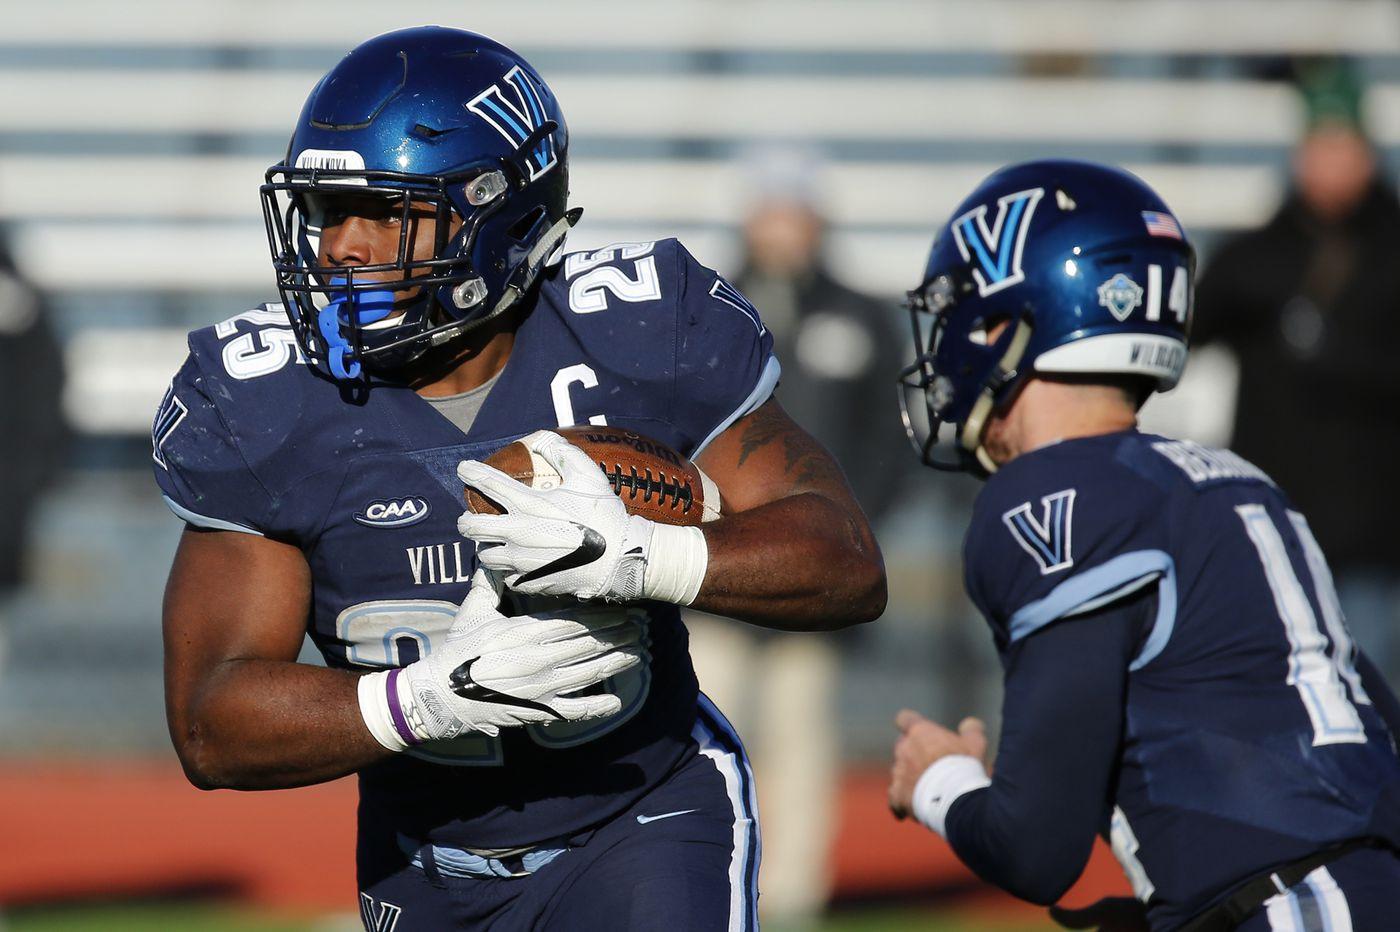 Villanova football beats Delaware, puts Blue Hens' postseason bid in jeopardy